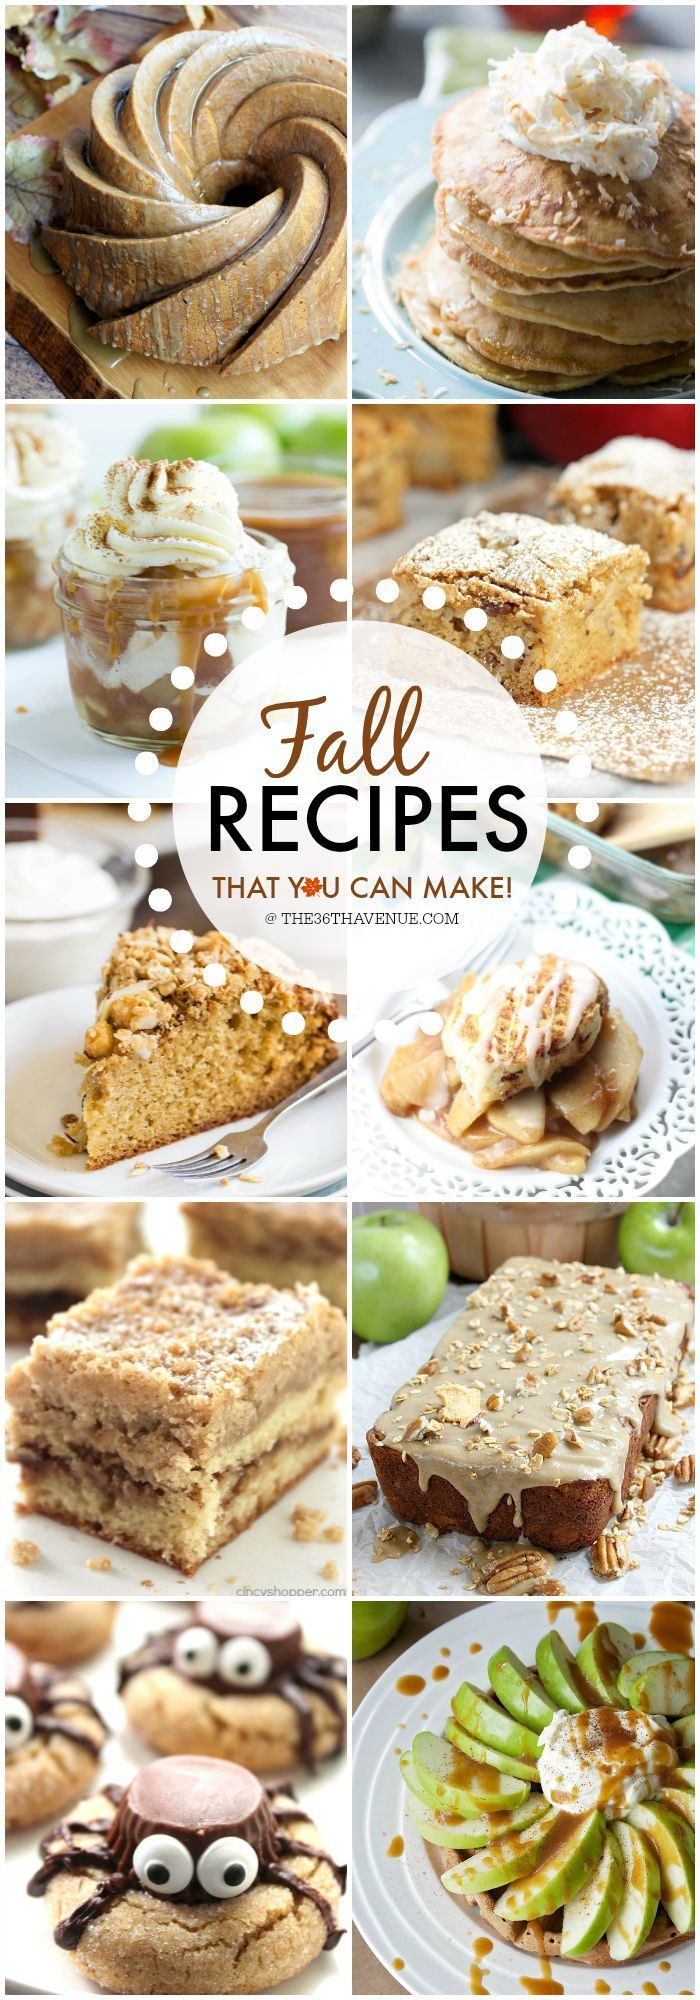 Fall Recipes Desserts and Treats Fall recipes, Fall